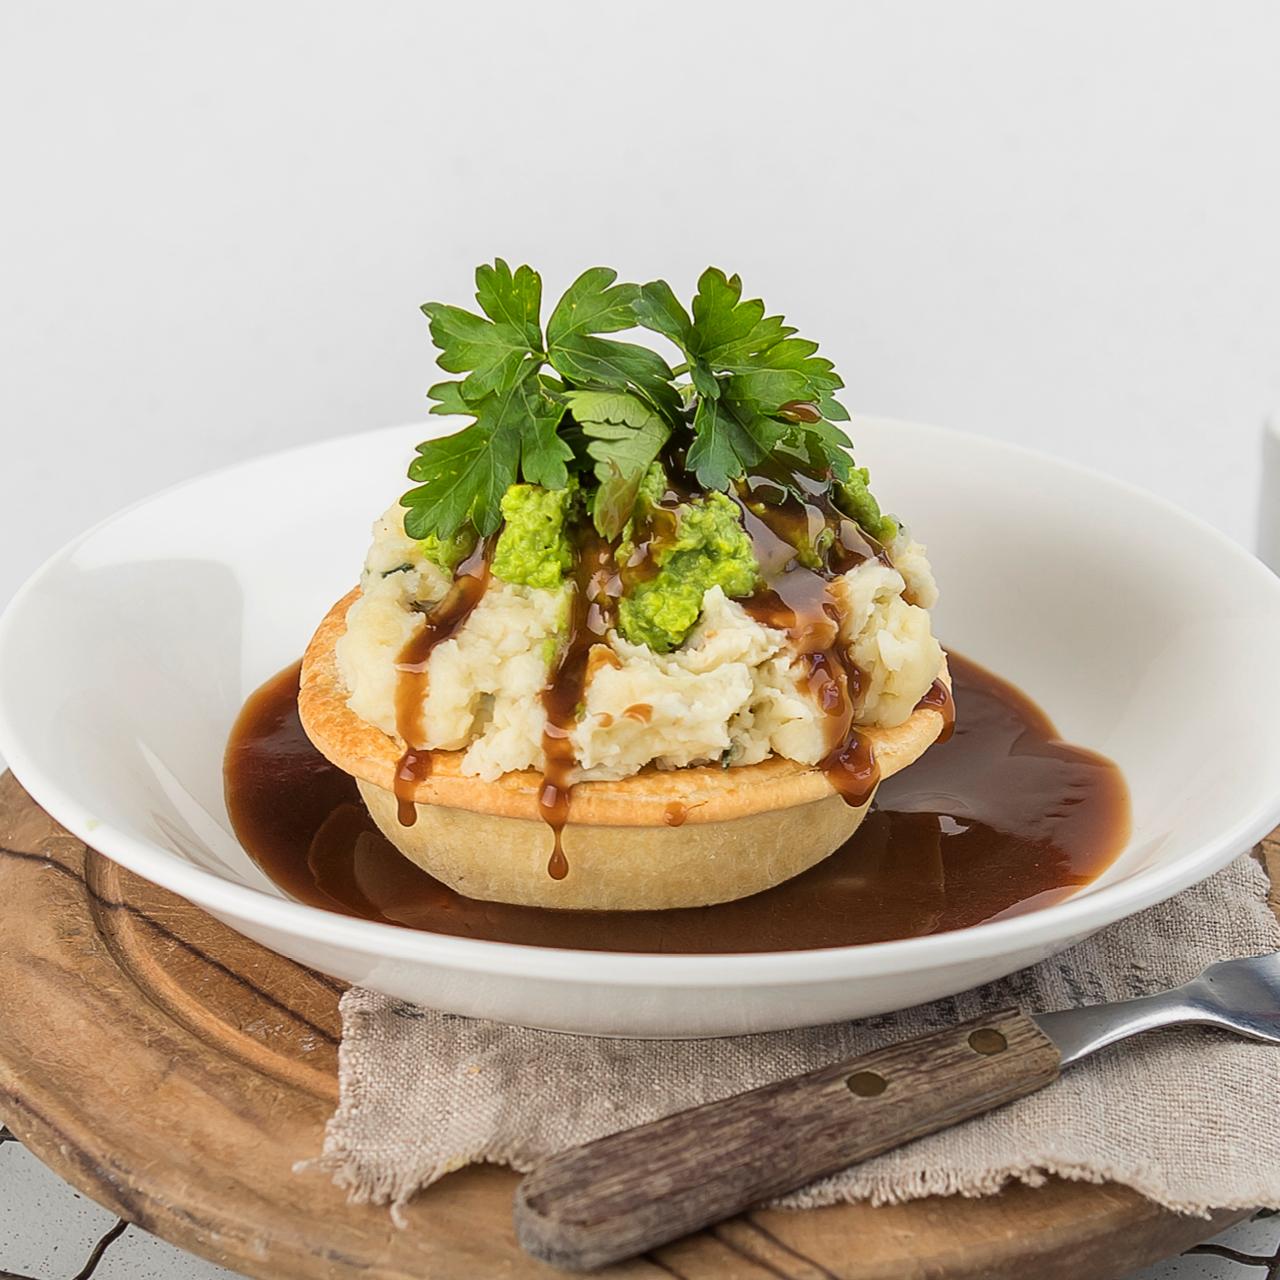 Pie with Mushy Peas, Mash & Gravy